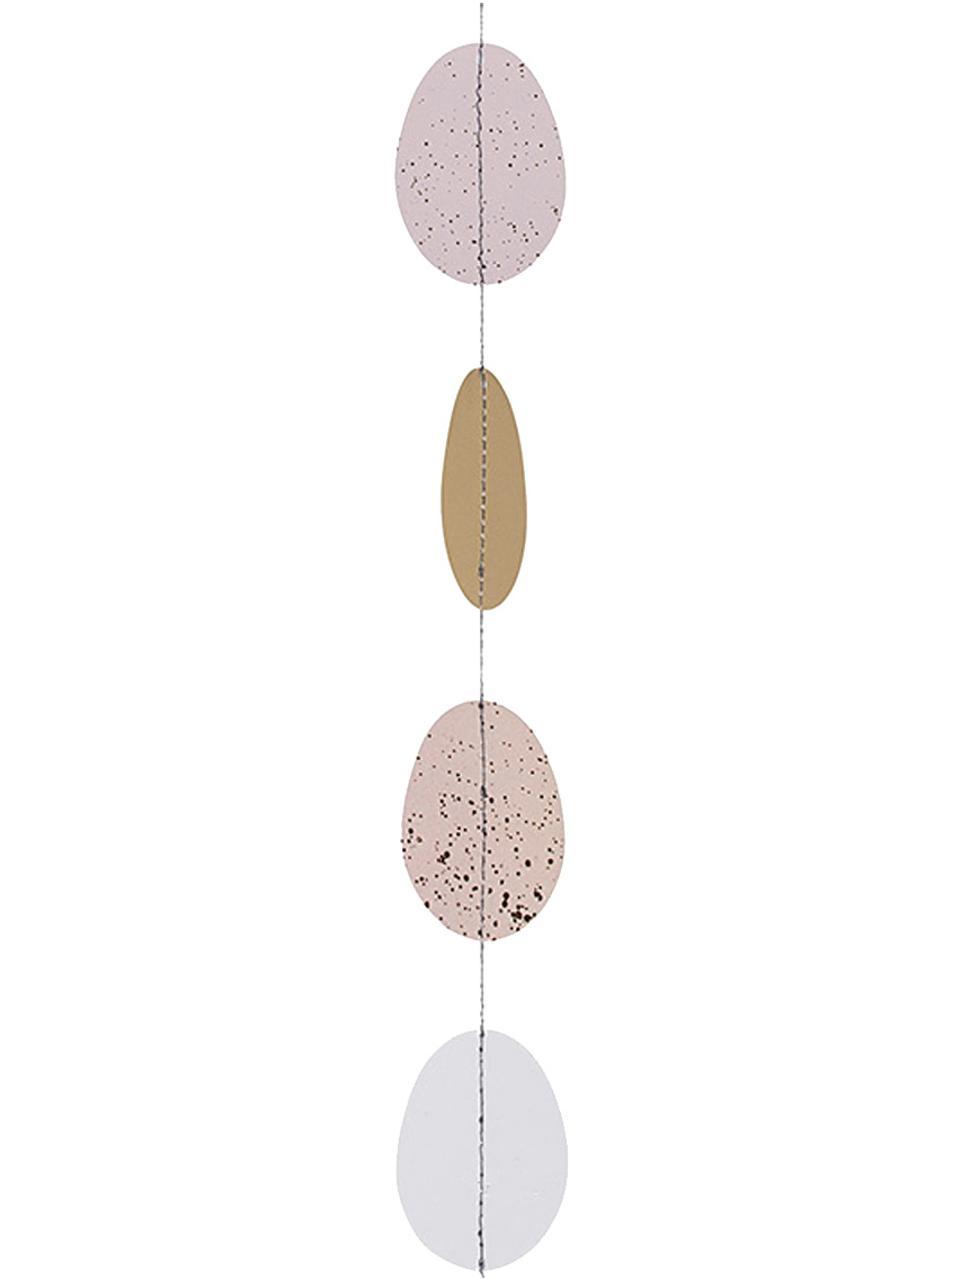 Girlande Easter Eggs, Papier, Mehrfarbig, 7 x 140 cm